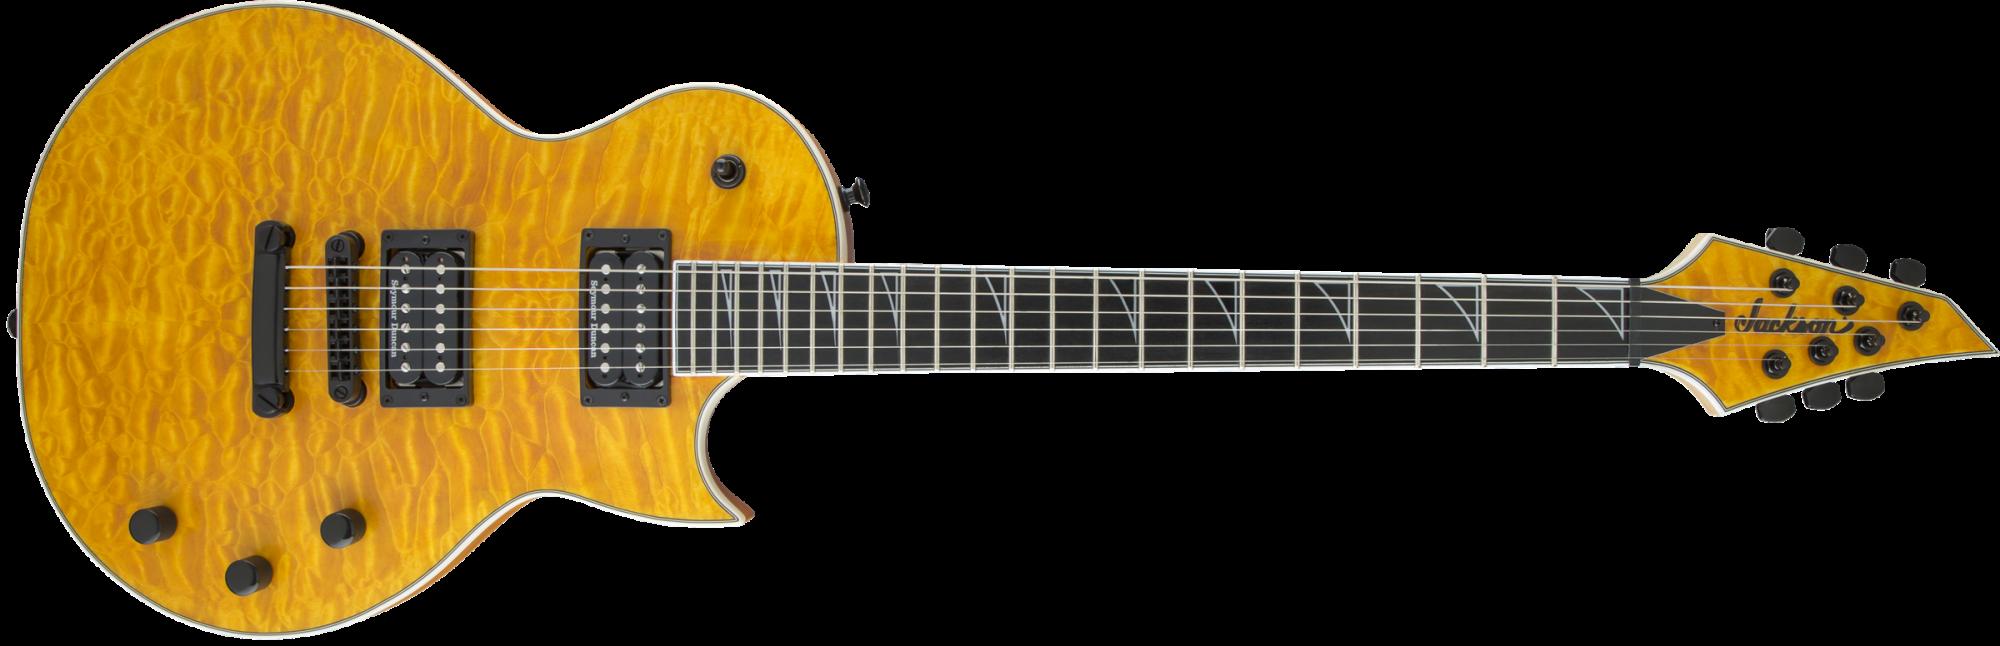 Jackson Pro Series Monarkh SCQ Guitar - Ebony Fingerboard - Satin Amber